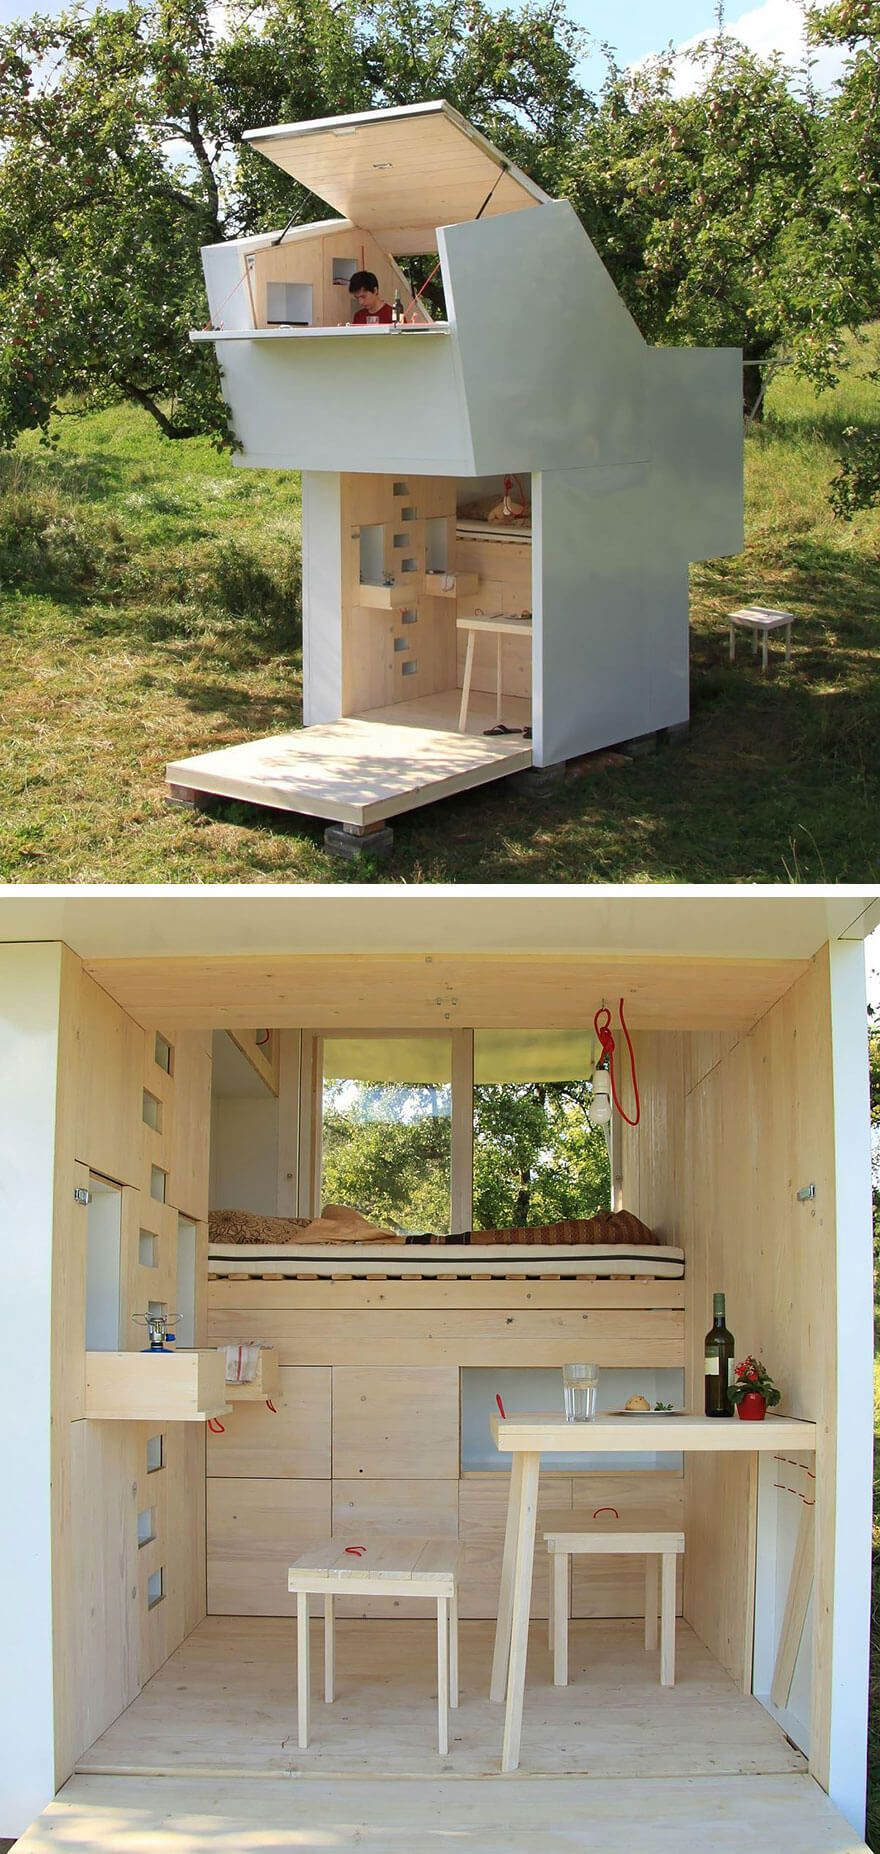 tiny houses petites maisons am nagement espace tiny homes pinterest tiny houses. Black Bedroom Furniture Sets. Home Design Ideas